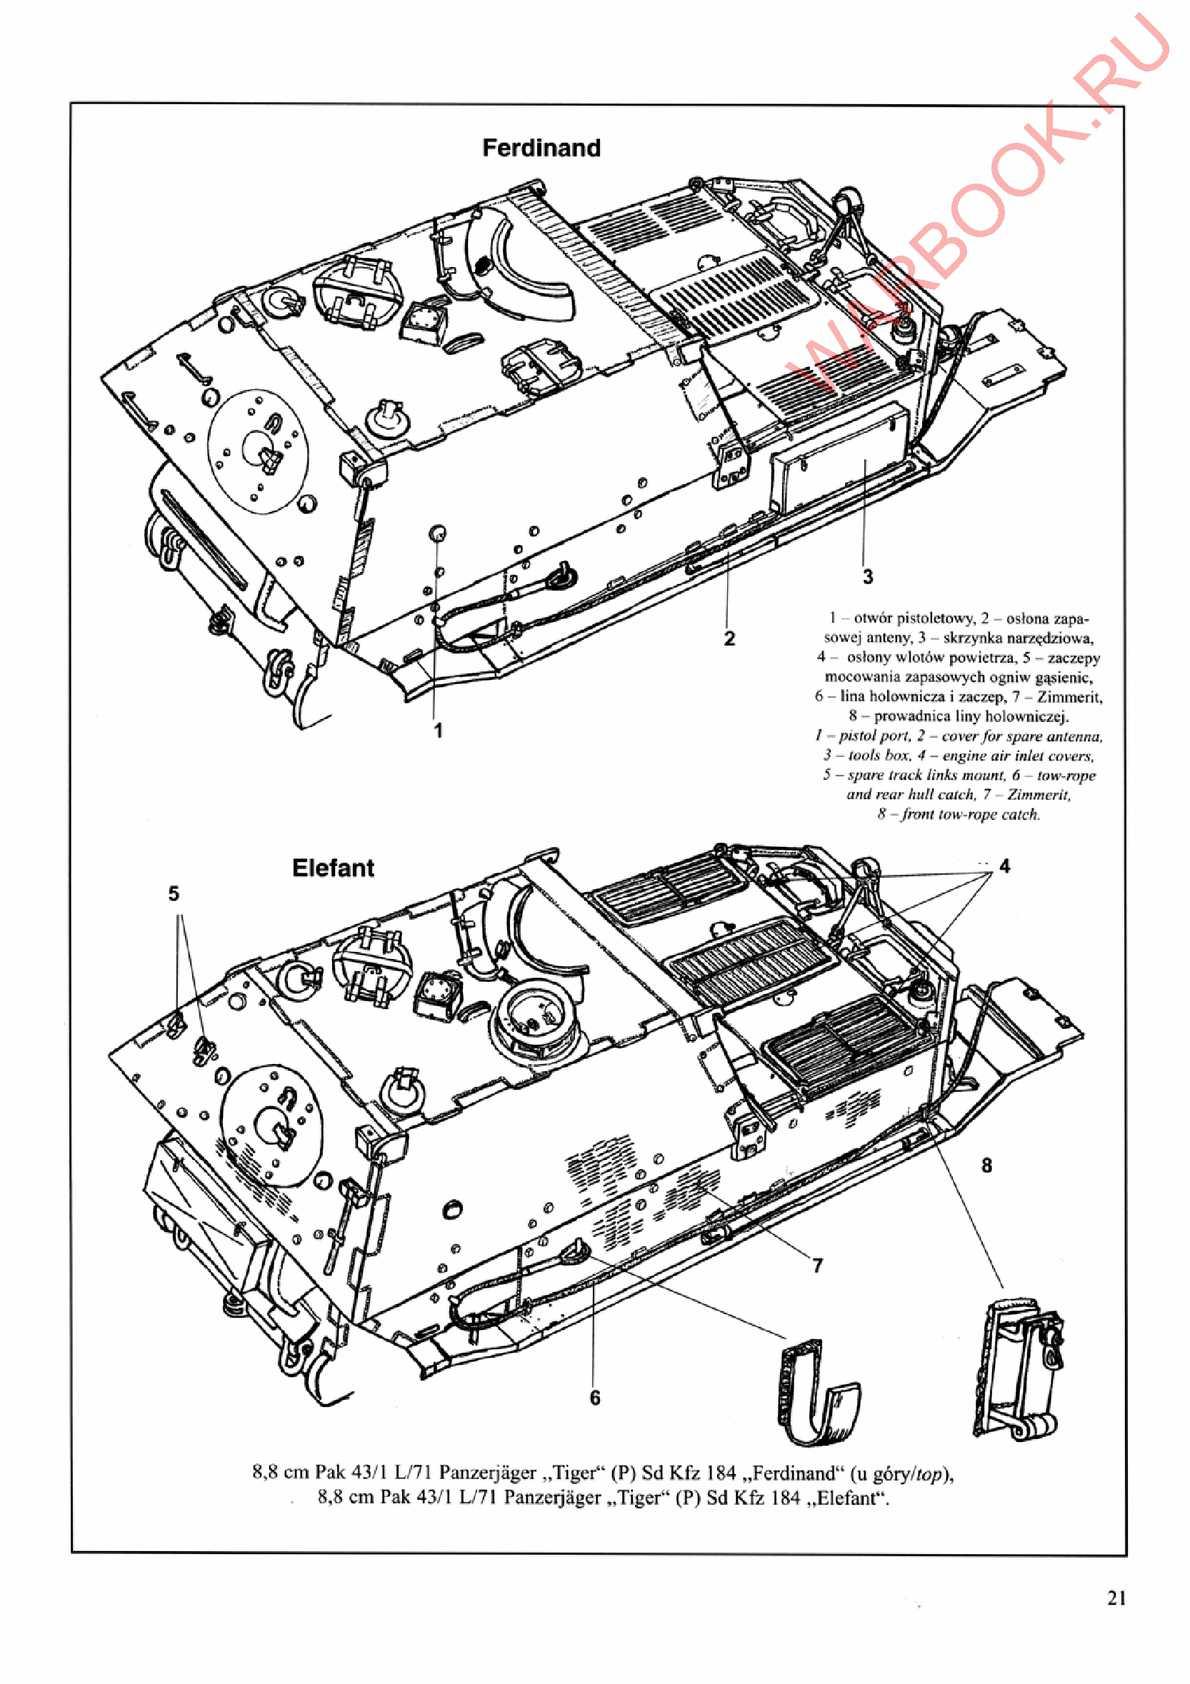 wydawnictwo militaria 187 ferdinand elefant calameo downloader Long Range Rifles page 21